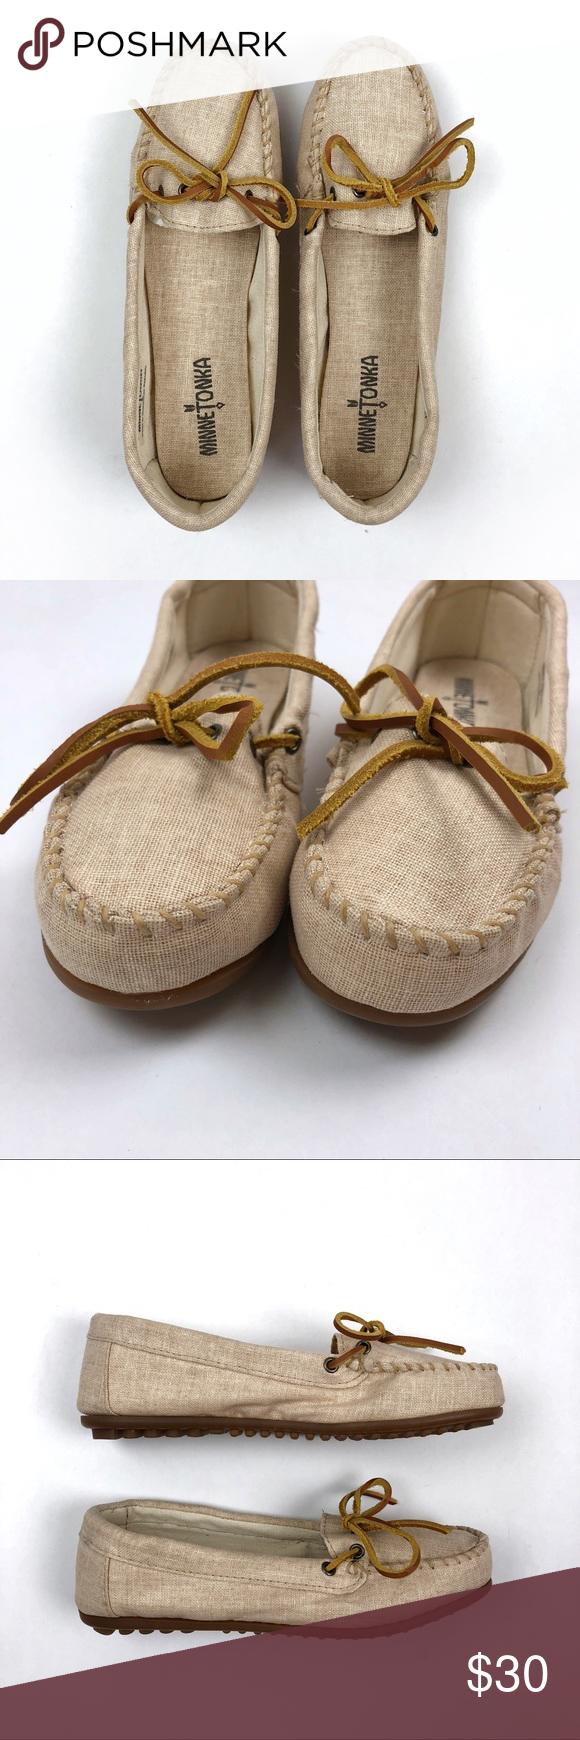 Minnetonka Beige Canvas Leather Tie Moccasins Left Shoe Minnetonka Shoes Canvas Leather